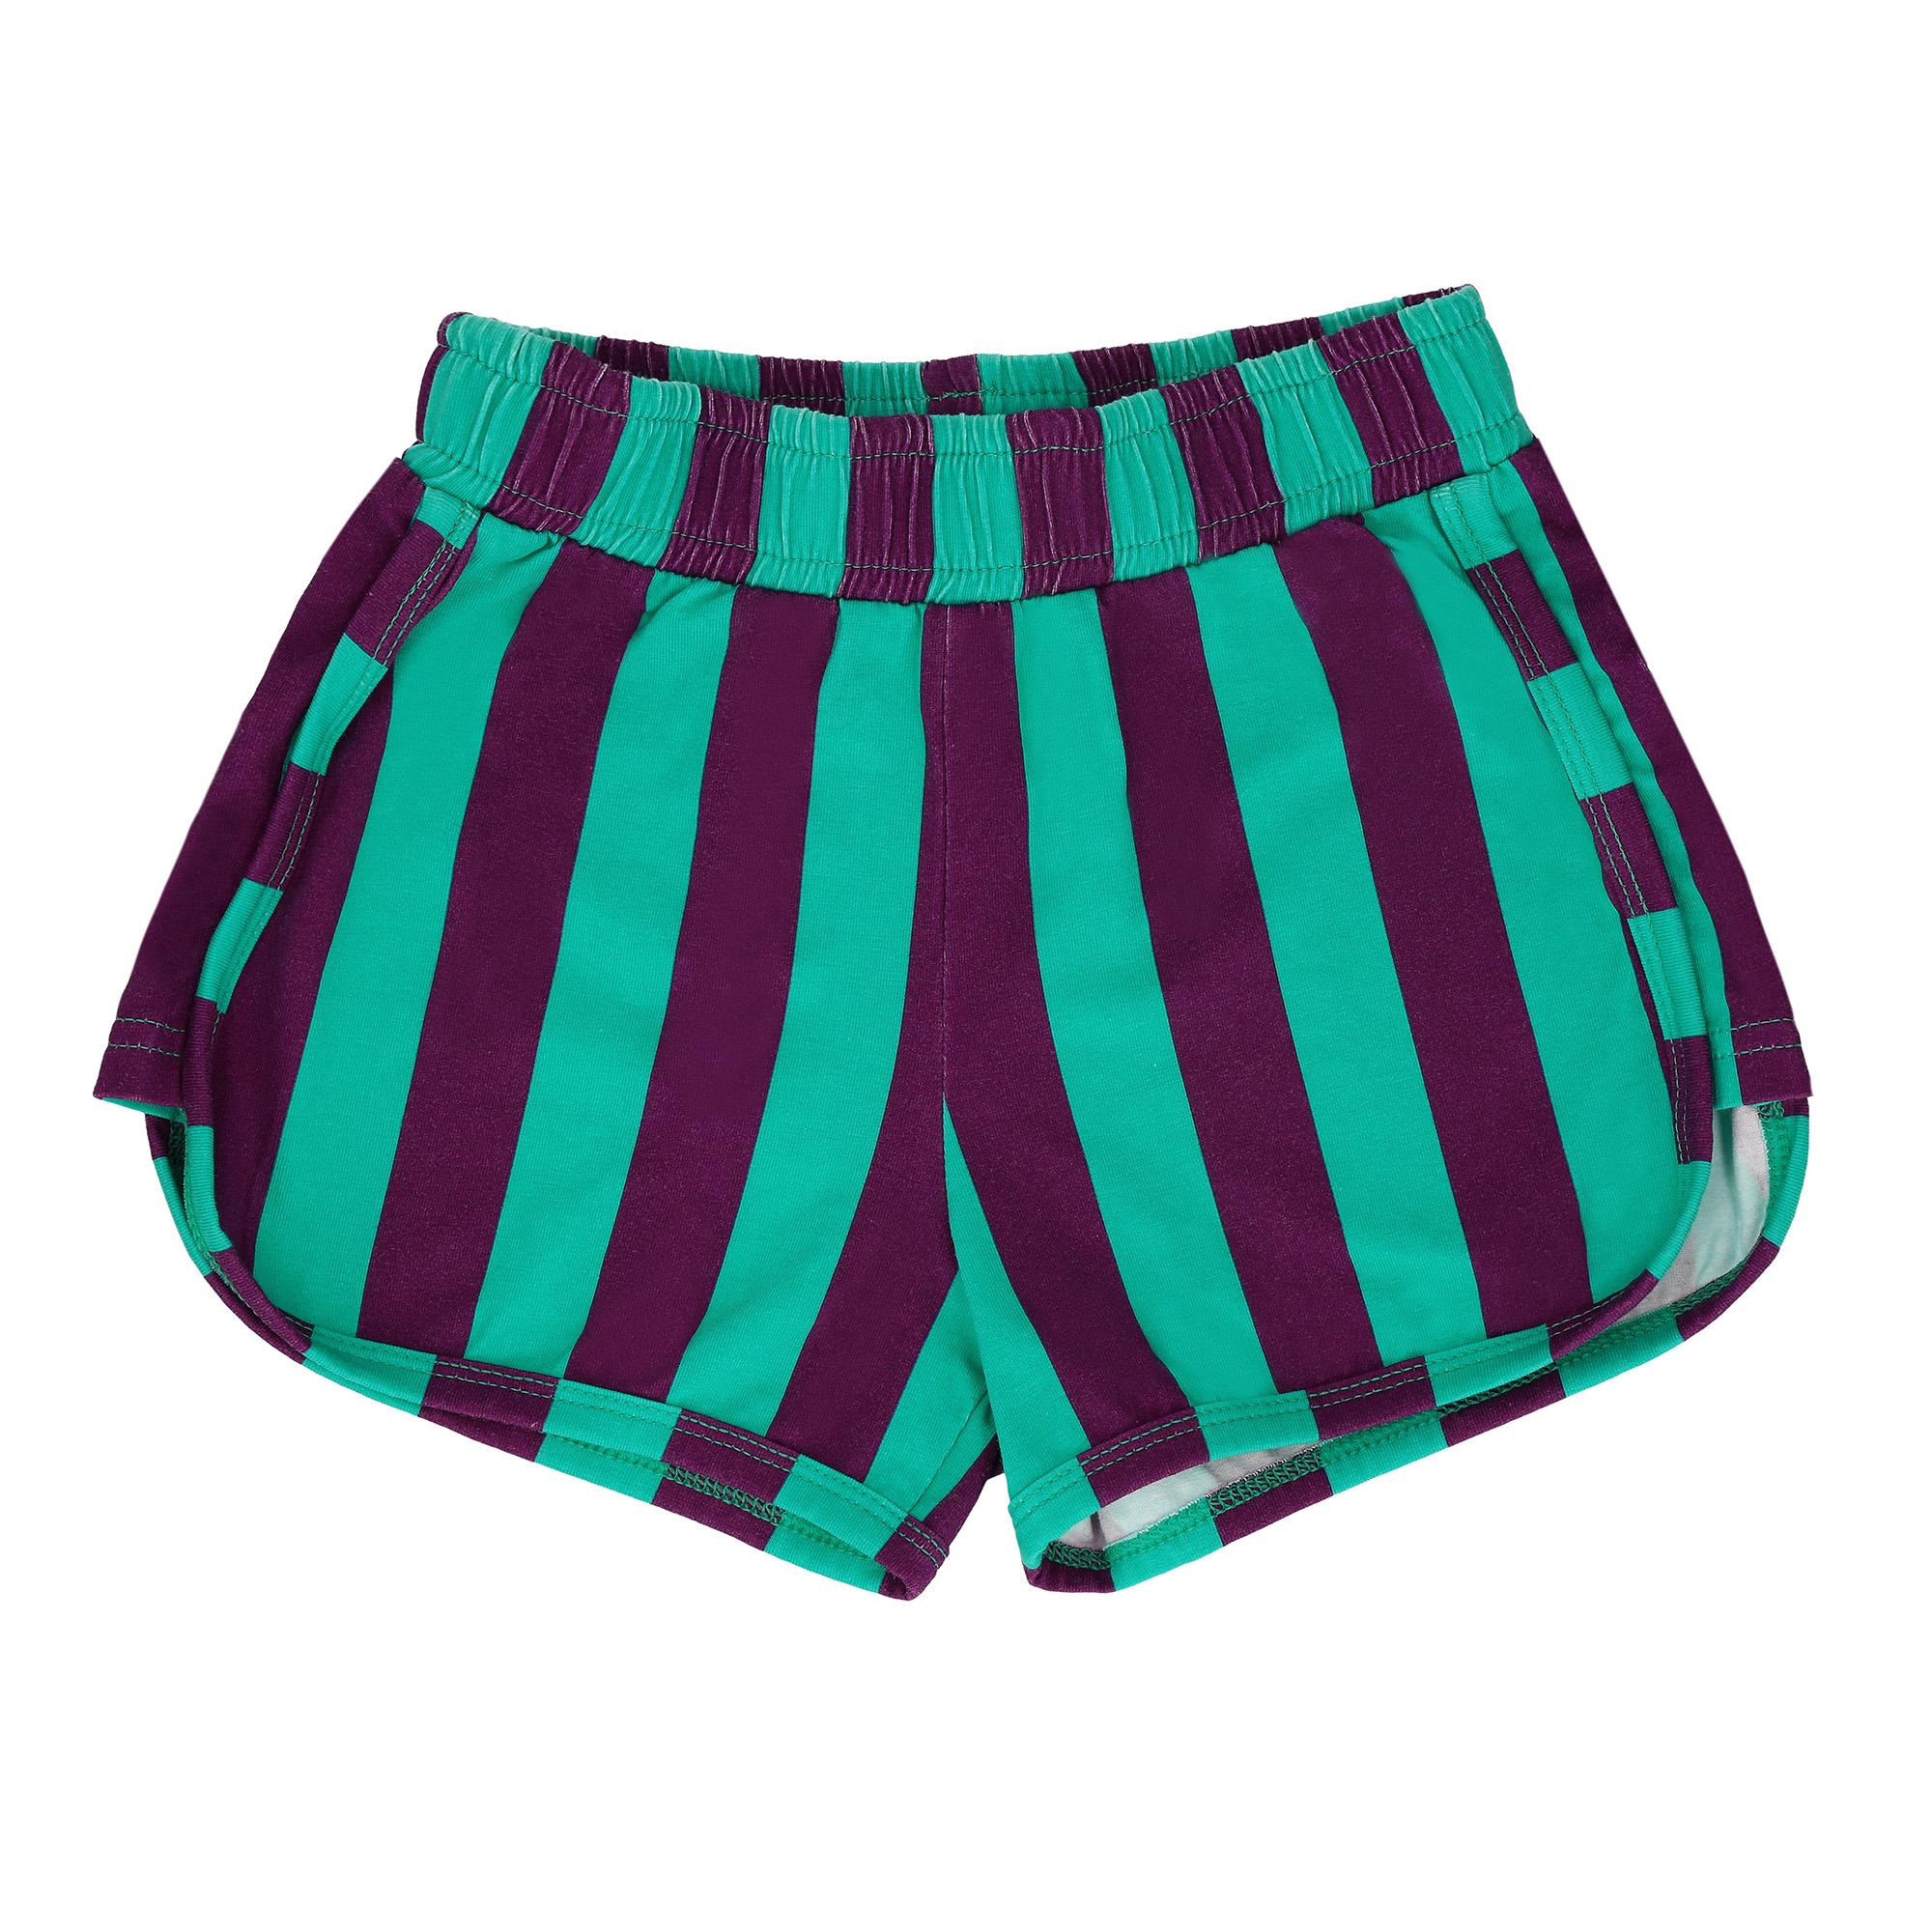 9dd596f80f1248 Raspberry Republic Stripetastic Shorts - Eddie & Min